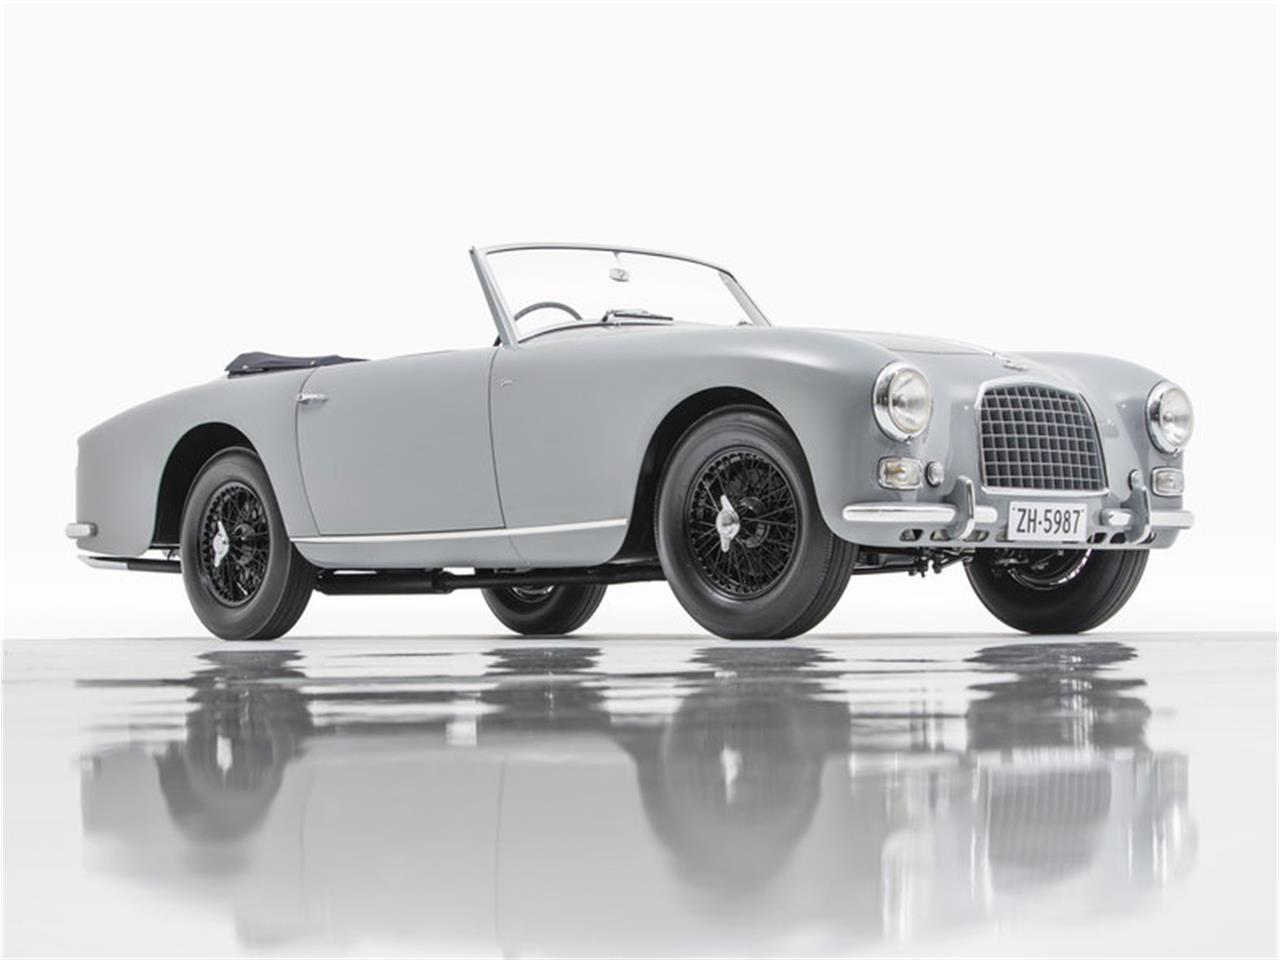 Aston Martin Coupe For Sale ClassicCarscom CC - Newport beach aston martin